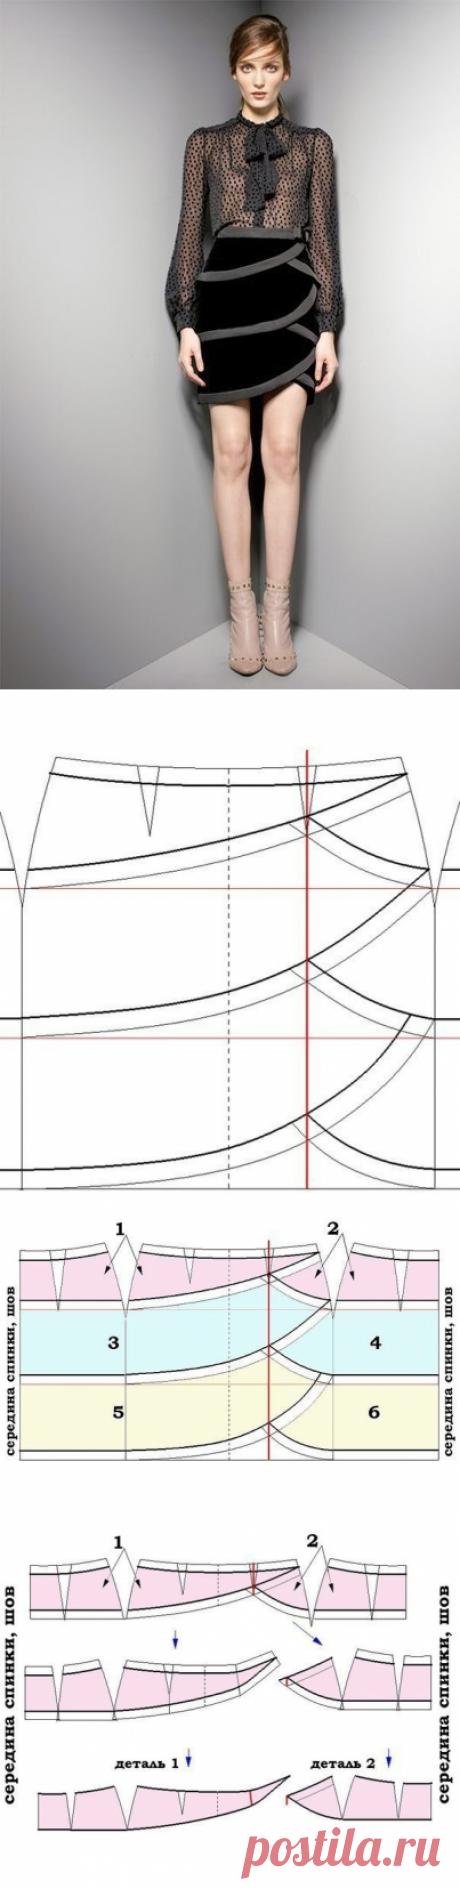 Портной • Шитье, переделки - легко!Шьем бархатную трехъярусную юбку из коллекции Valentino Pre-collezioni Autunno Inverno